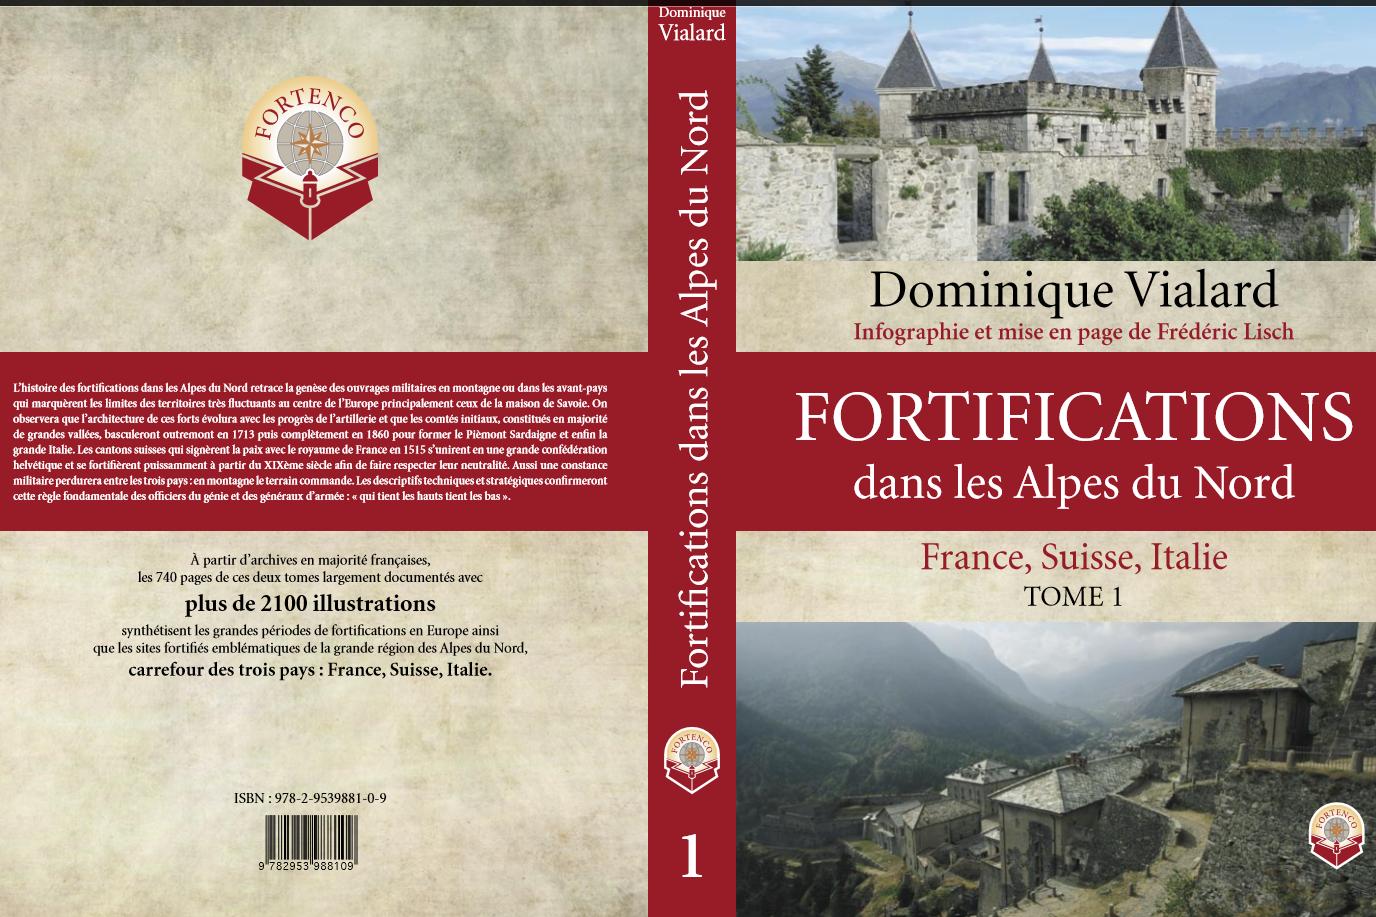 Fortifications dans les Alpes du nord Tome 1